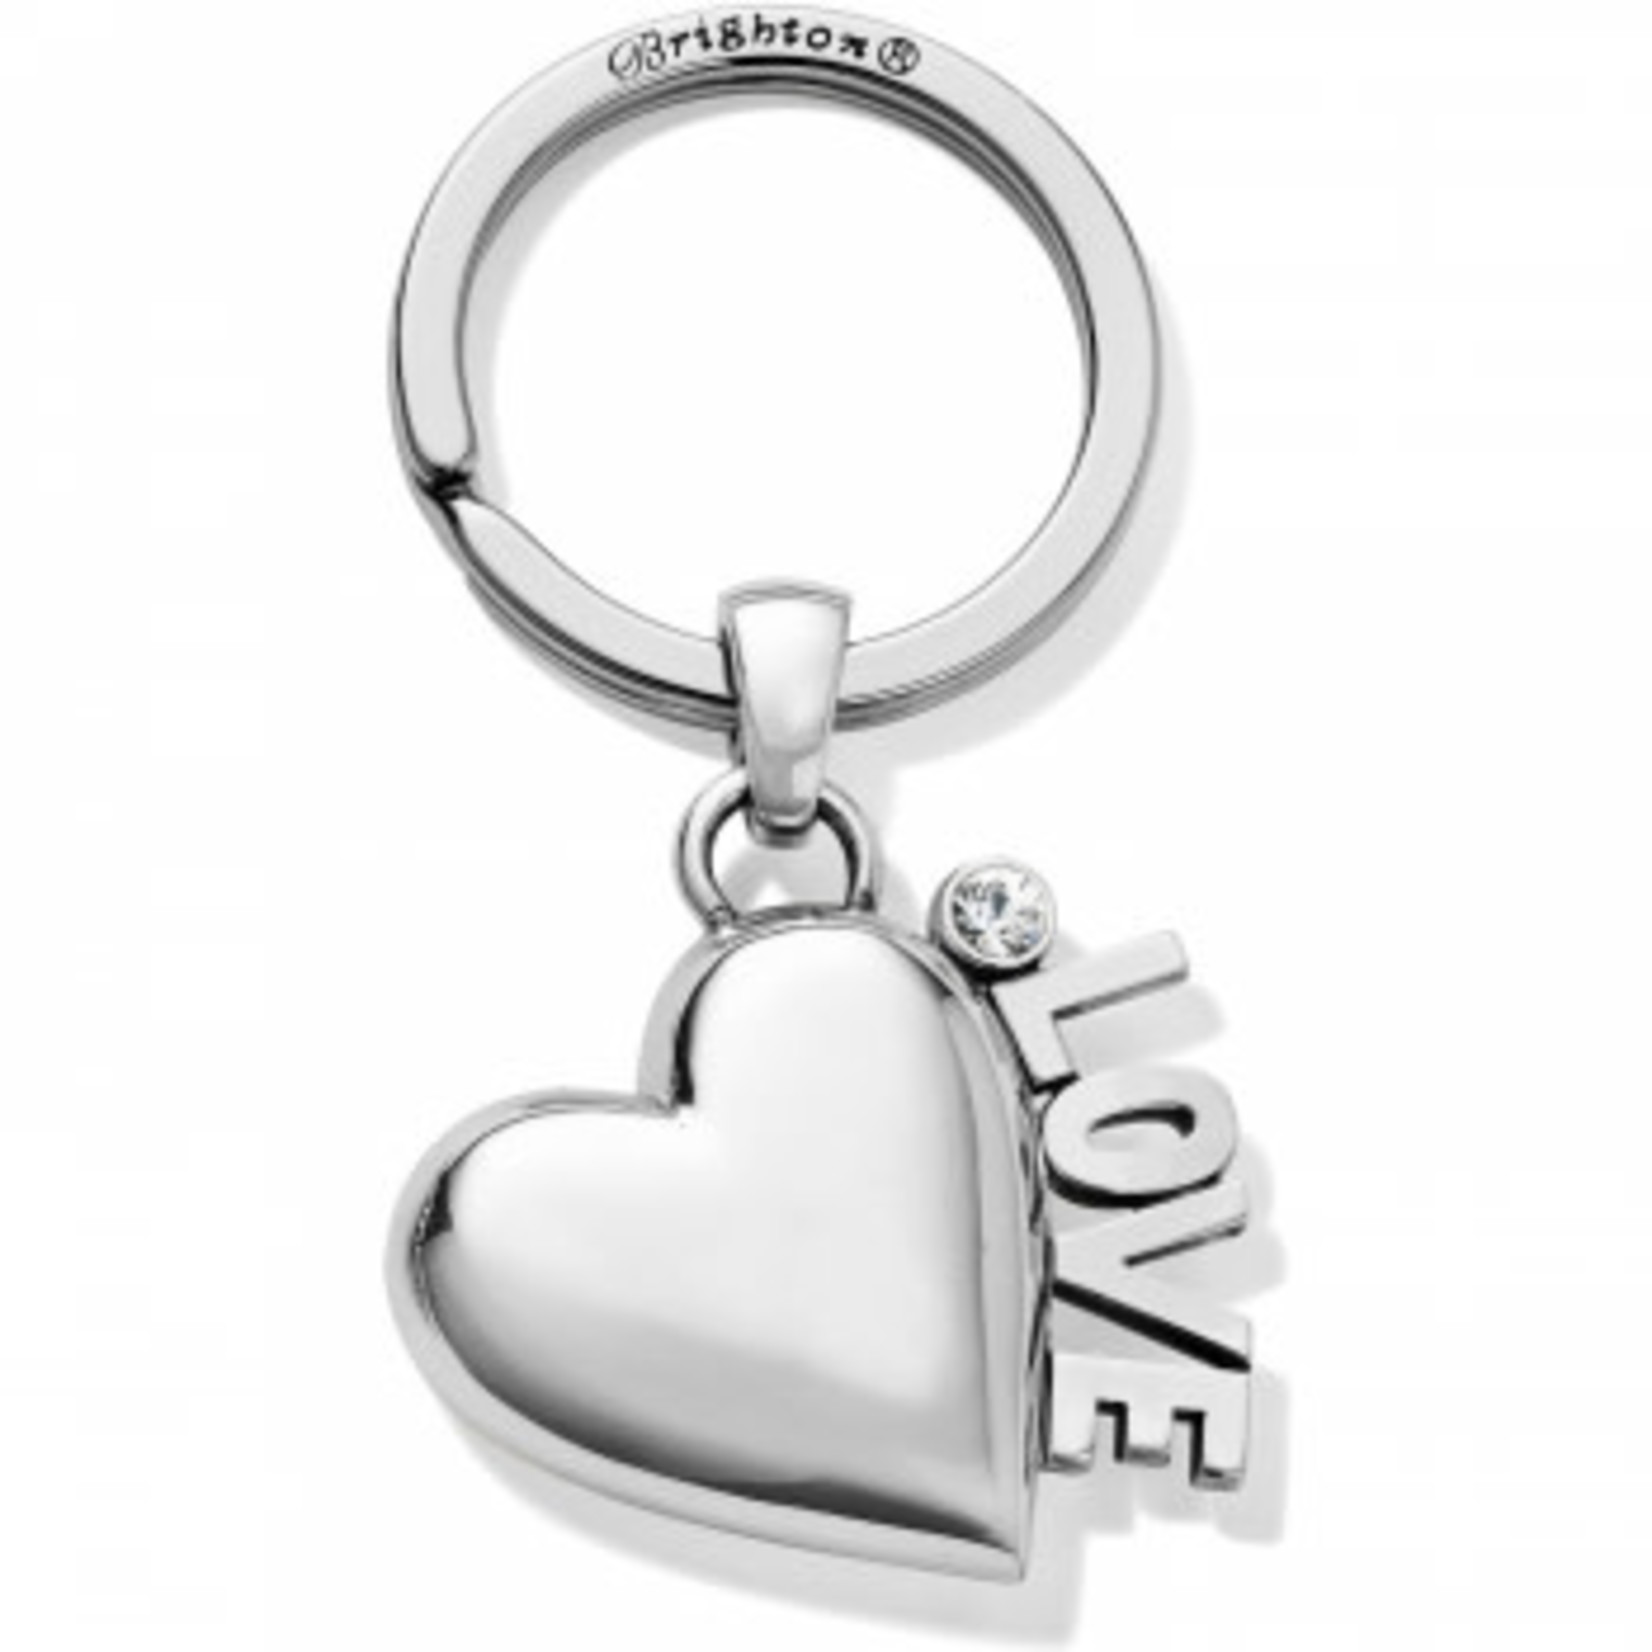 Brighton My Love Key Fob